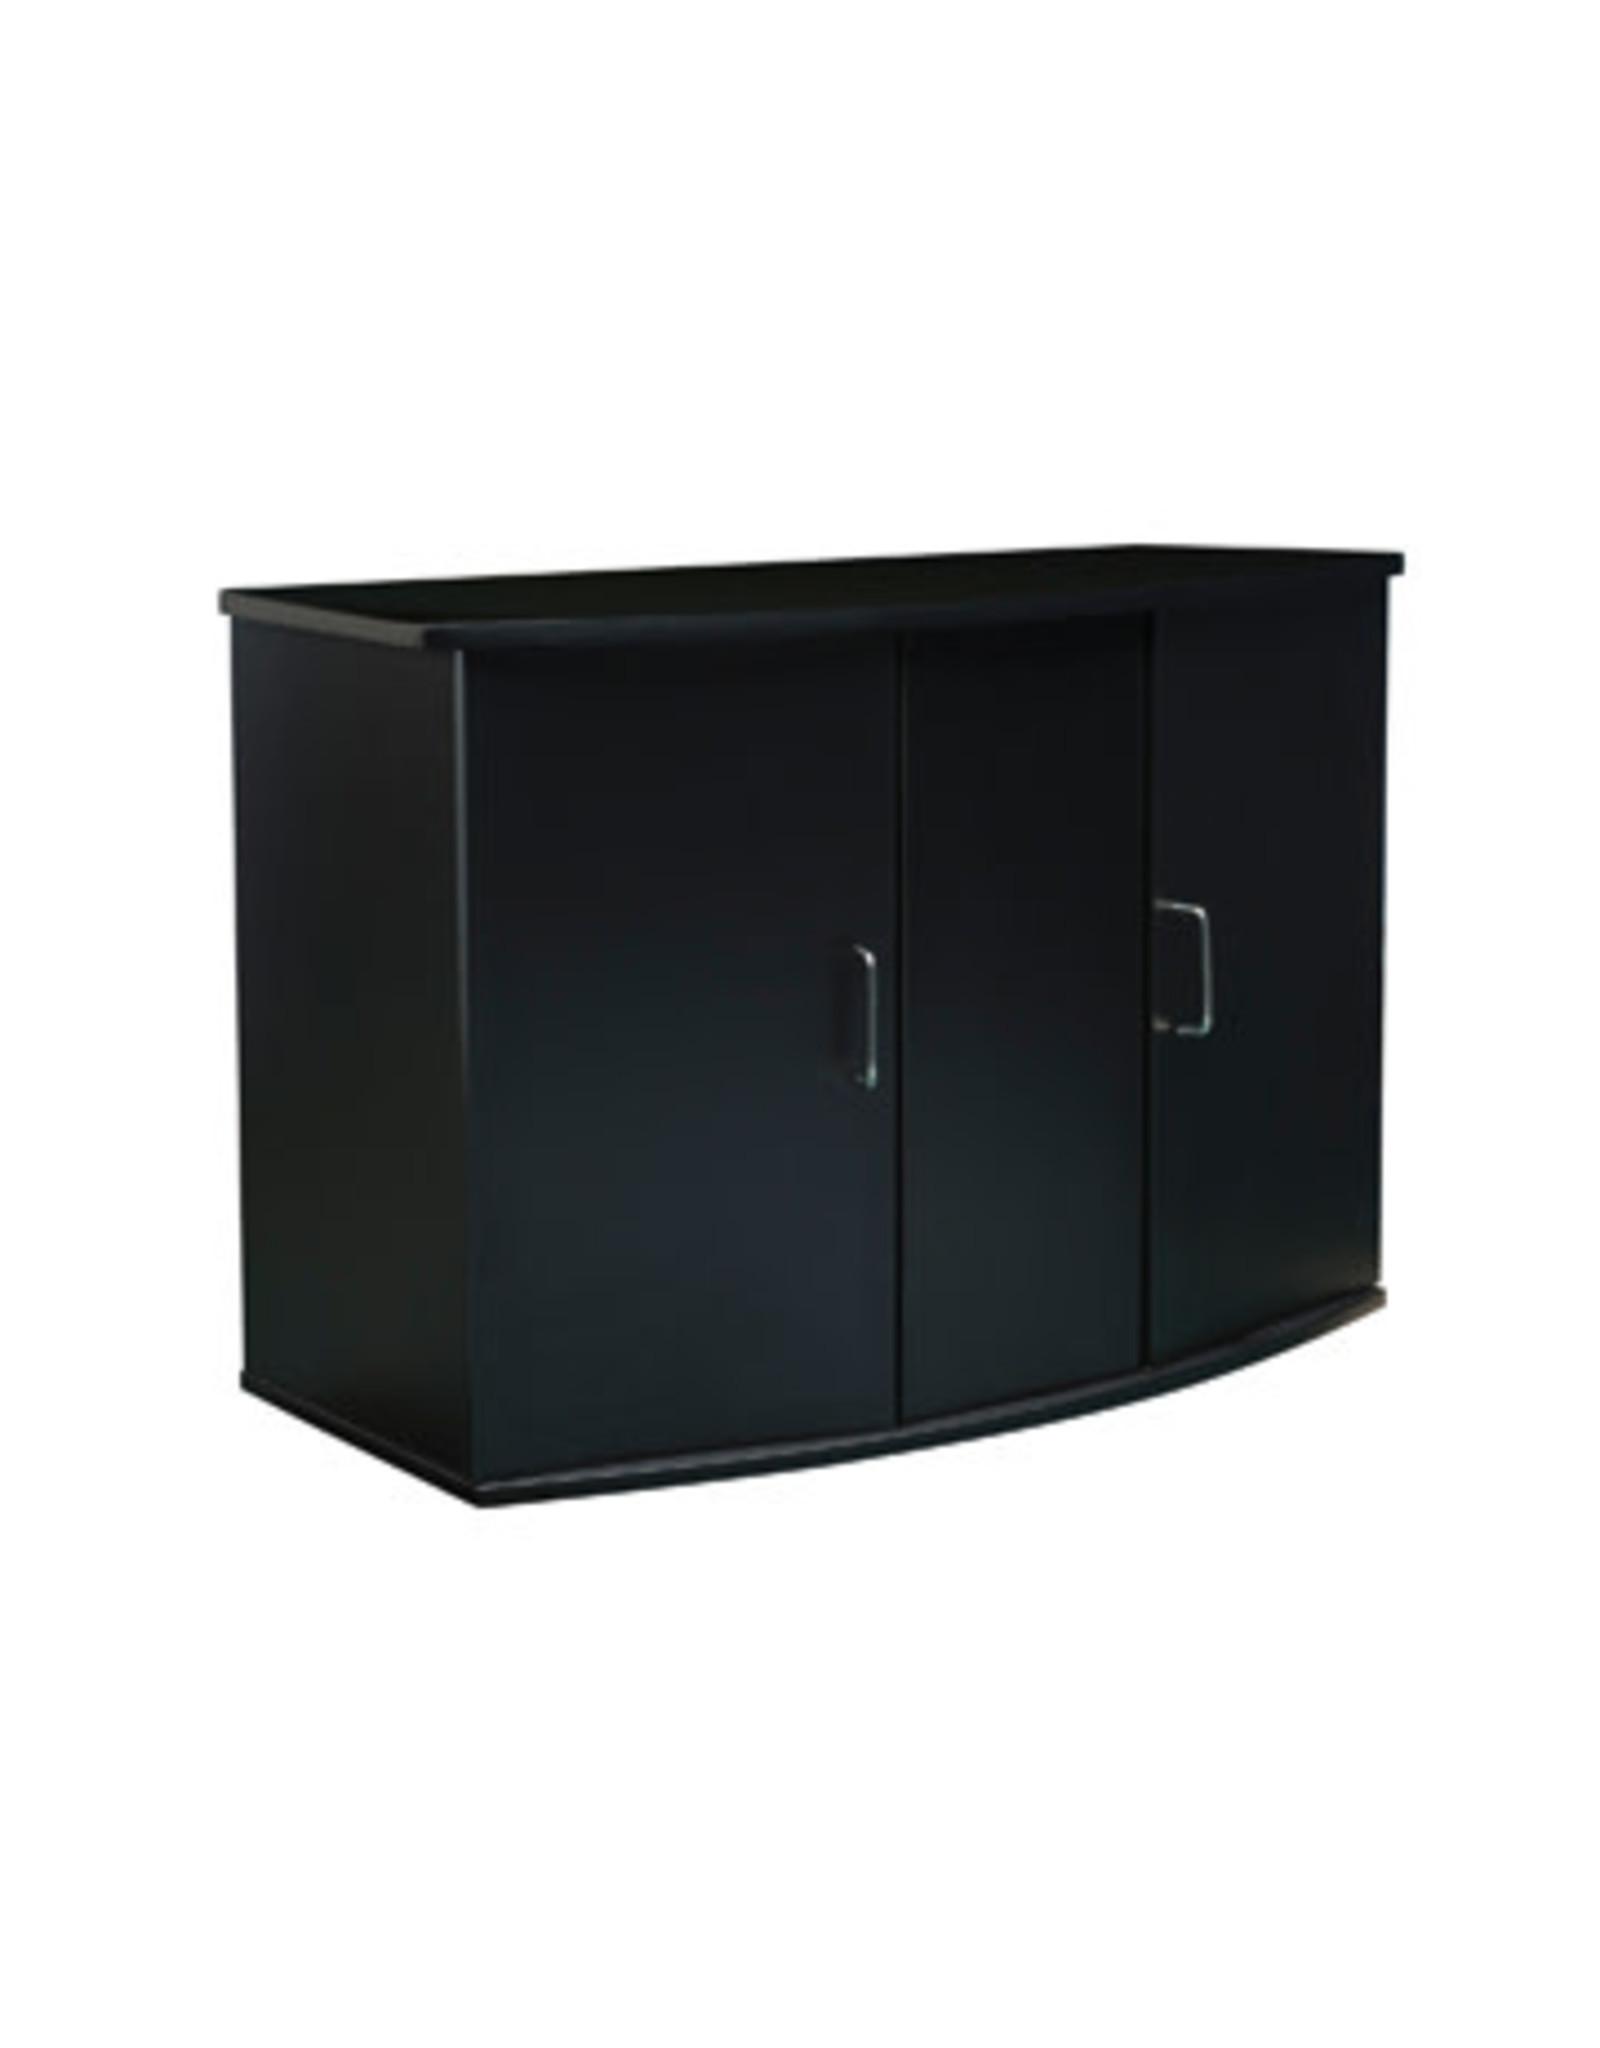 "Fluval Fluval Bow Front Aquarium Cabinet - 37"" x 16.5"" x 26"" (94 cm x 42 cm x 66 cm) - Black"